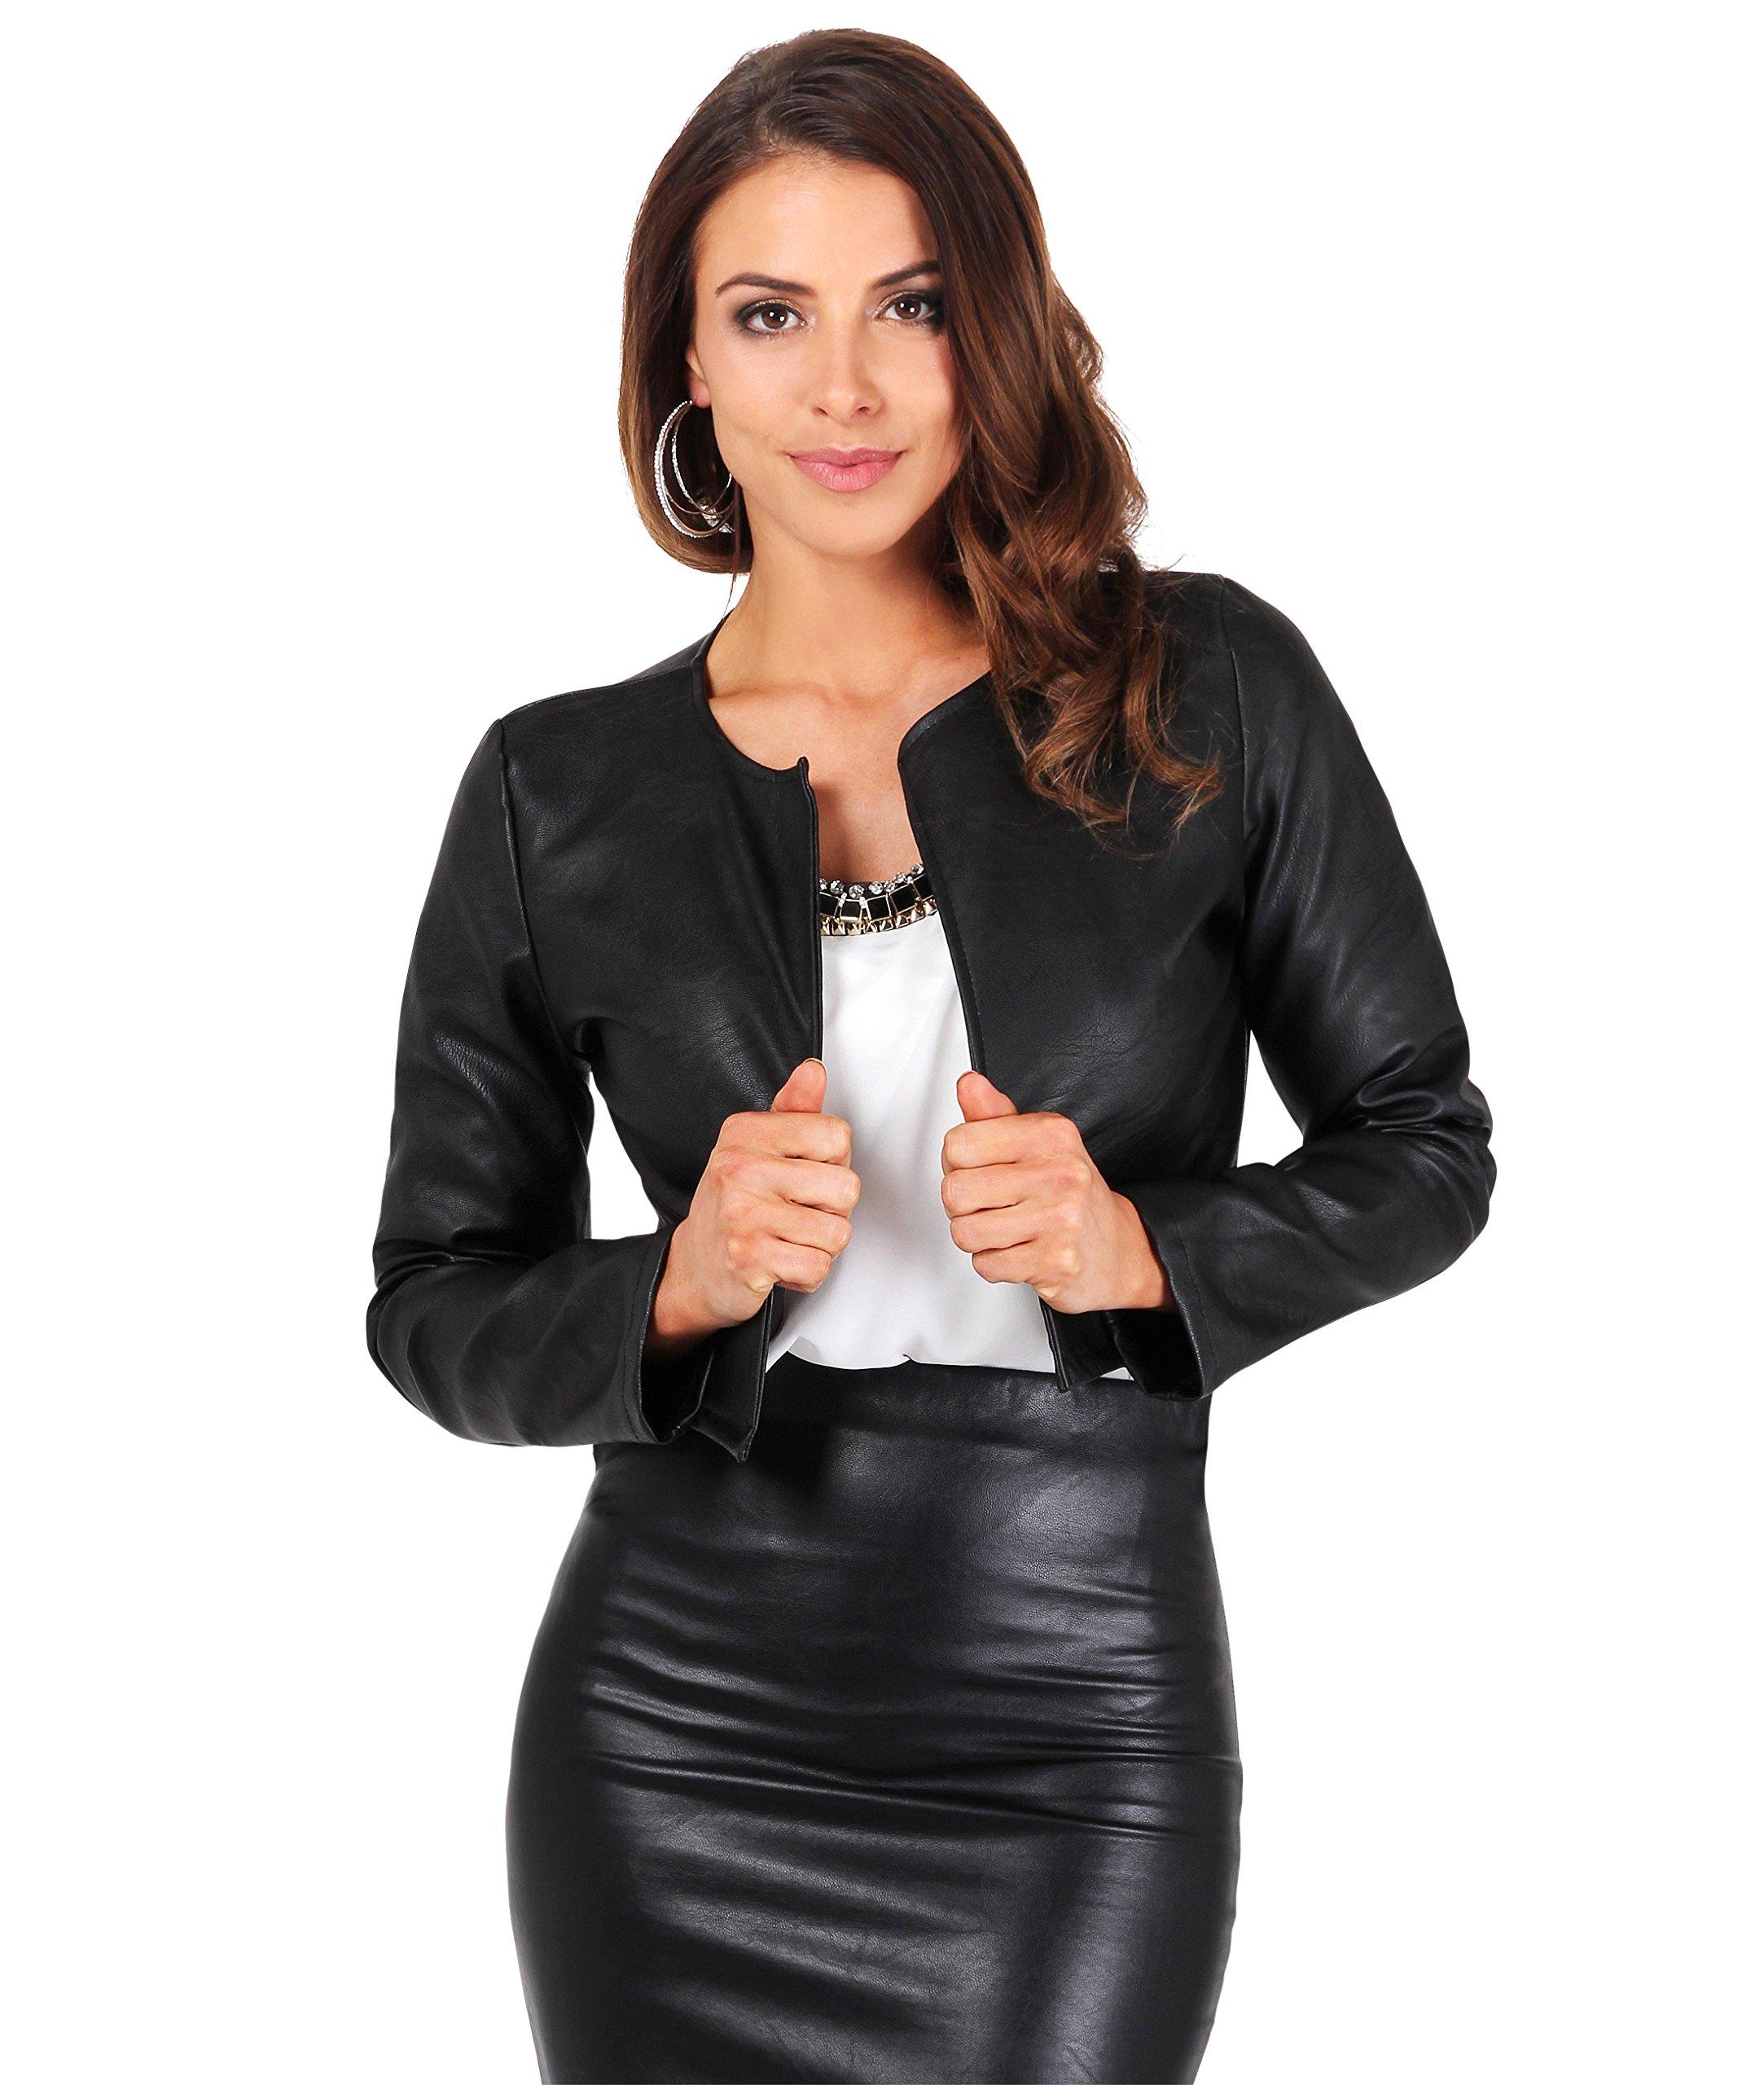 KRISP PU Cropped Open Jacket (Black, X-Large),[4432-BLK-XL]